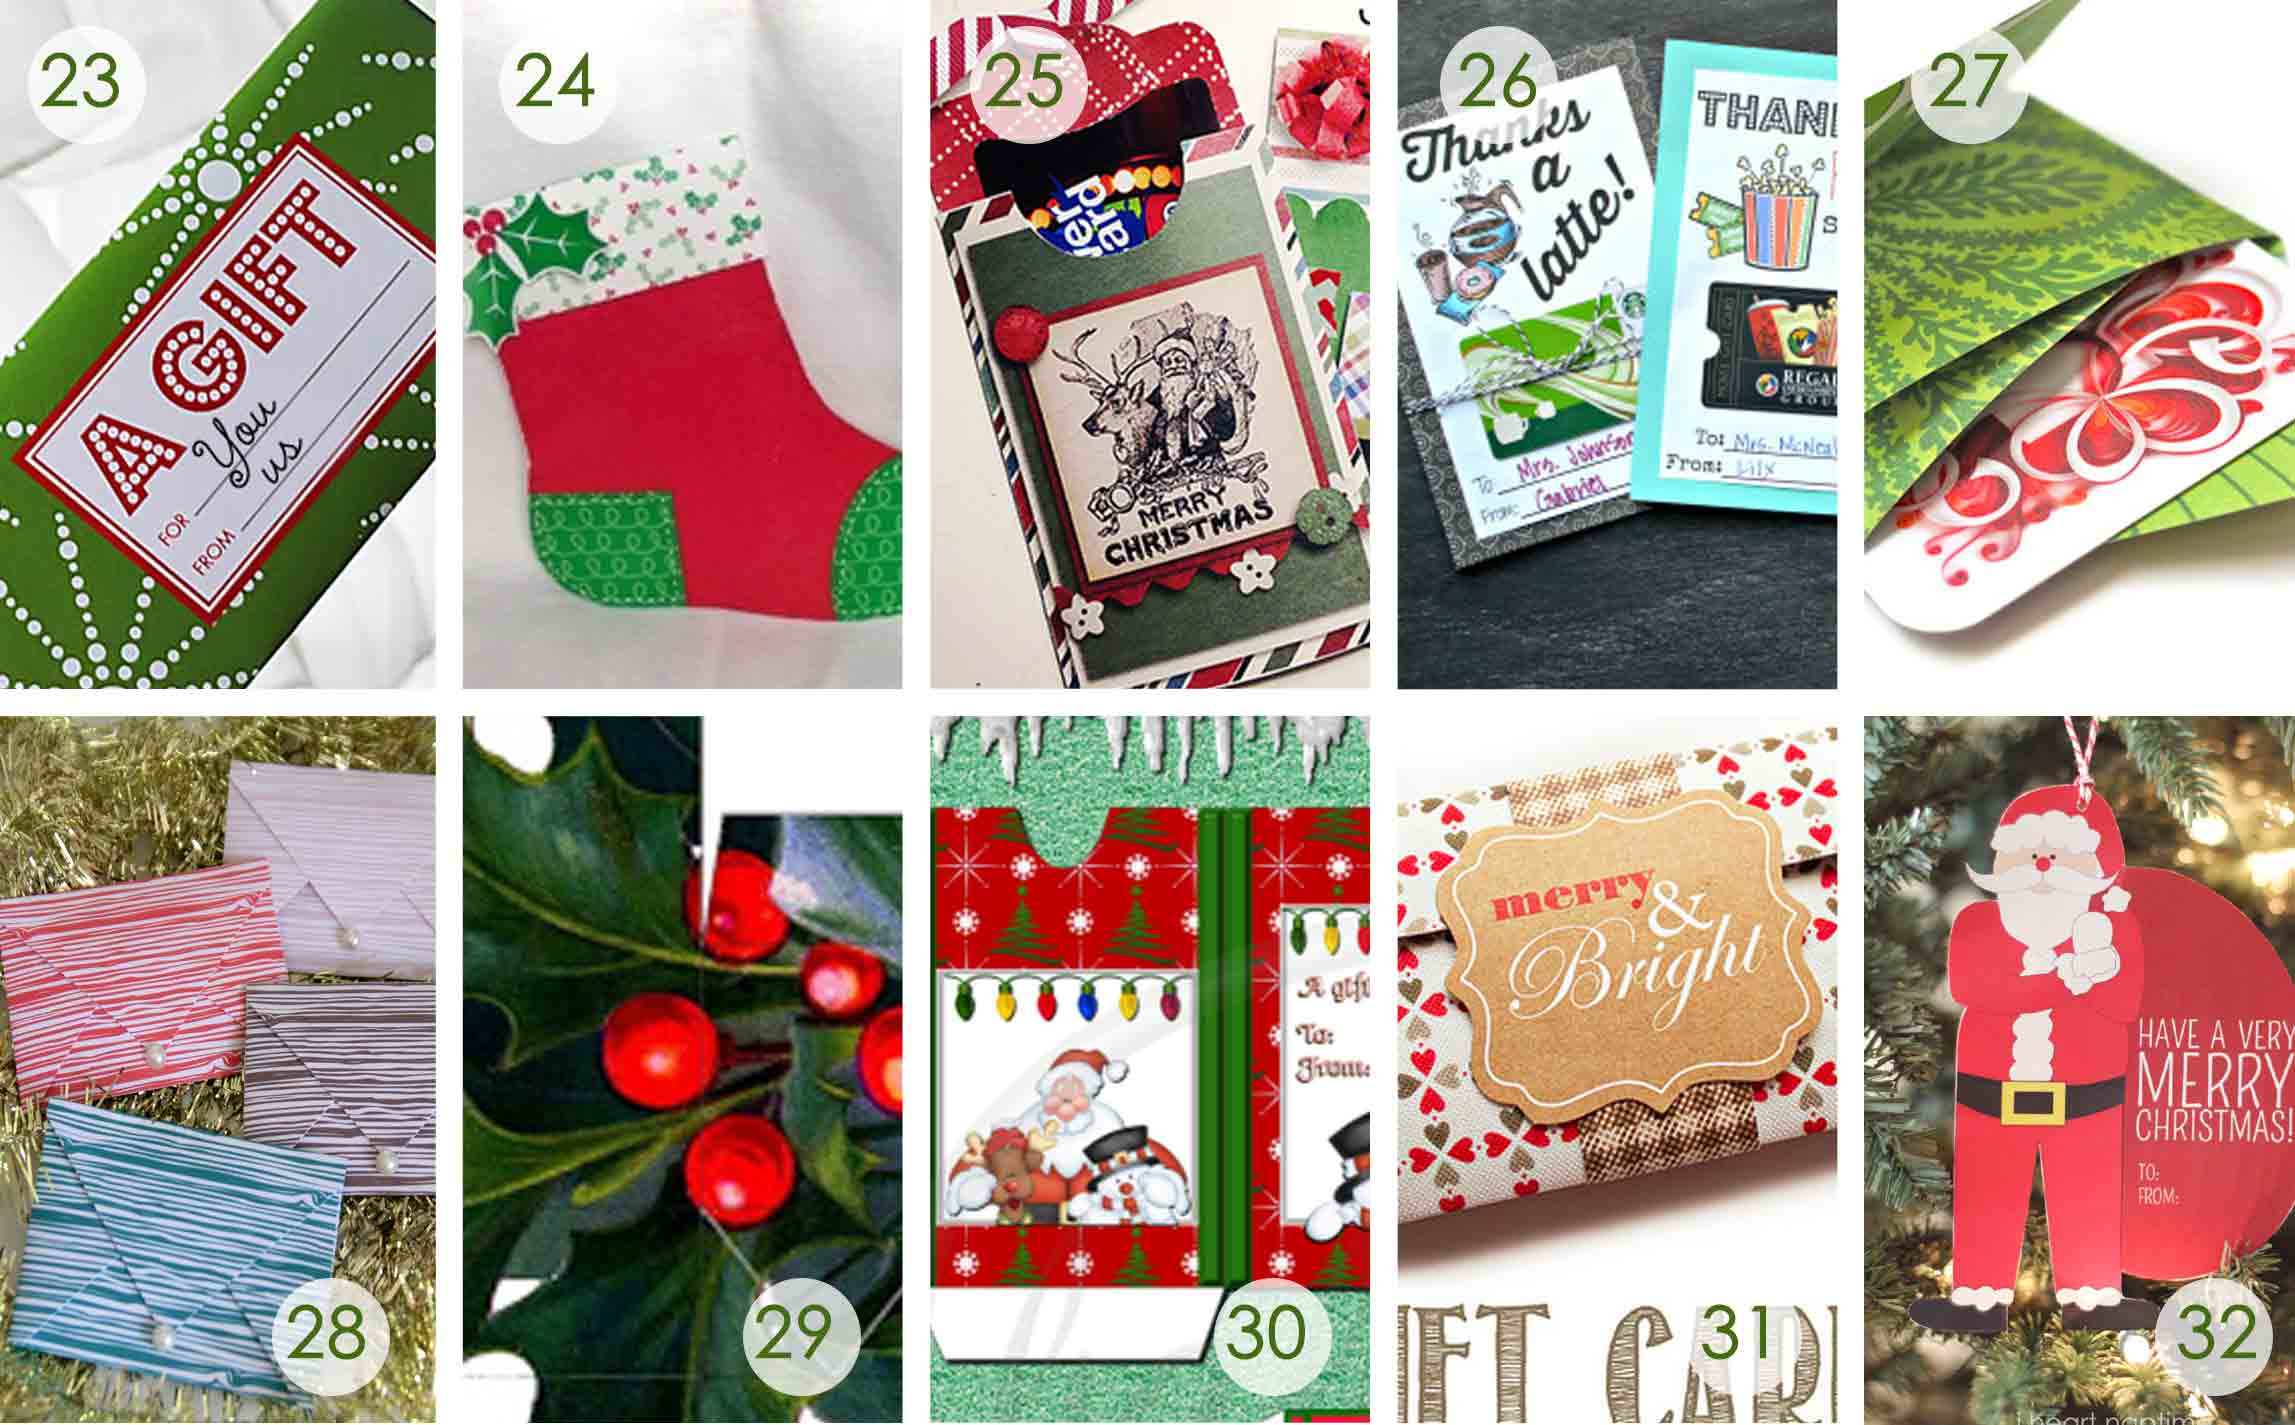 Over 50 Printable Gift Card Holders For The Holidays | Gcg - Free Printable Christmas Money Holder Cards